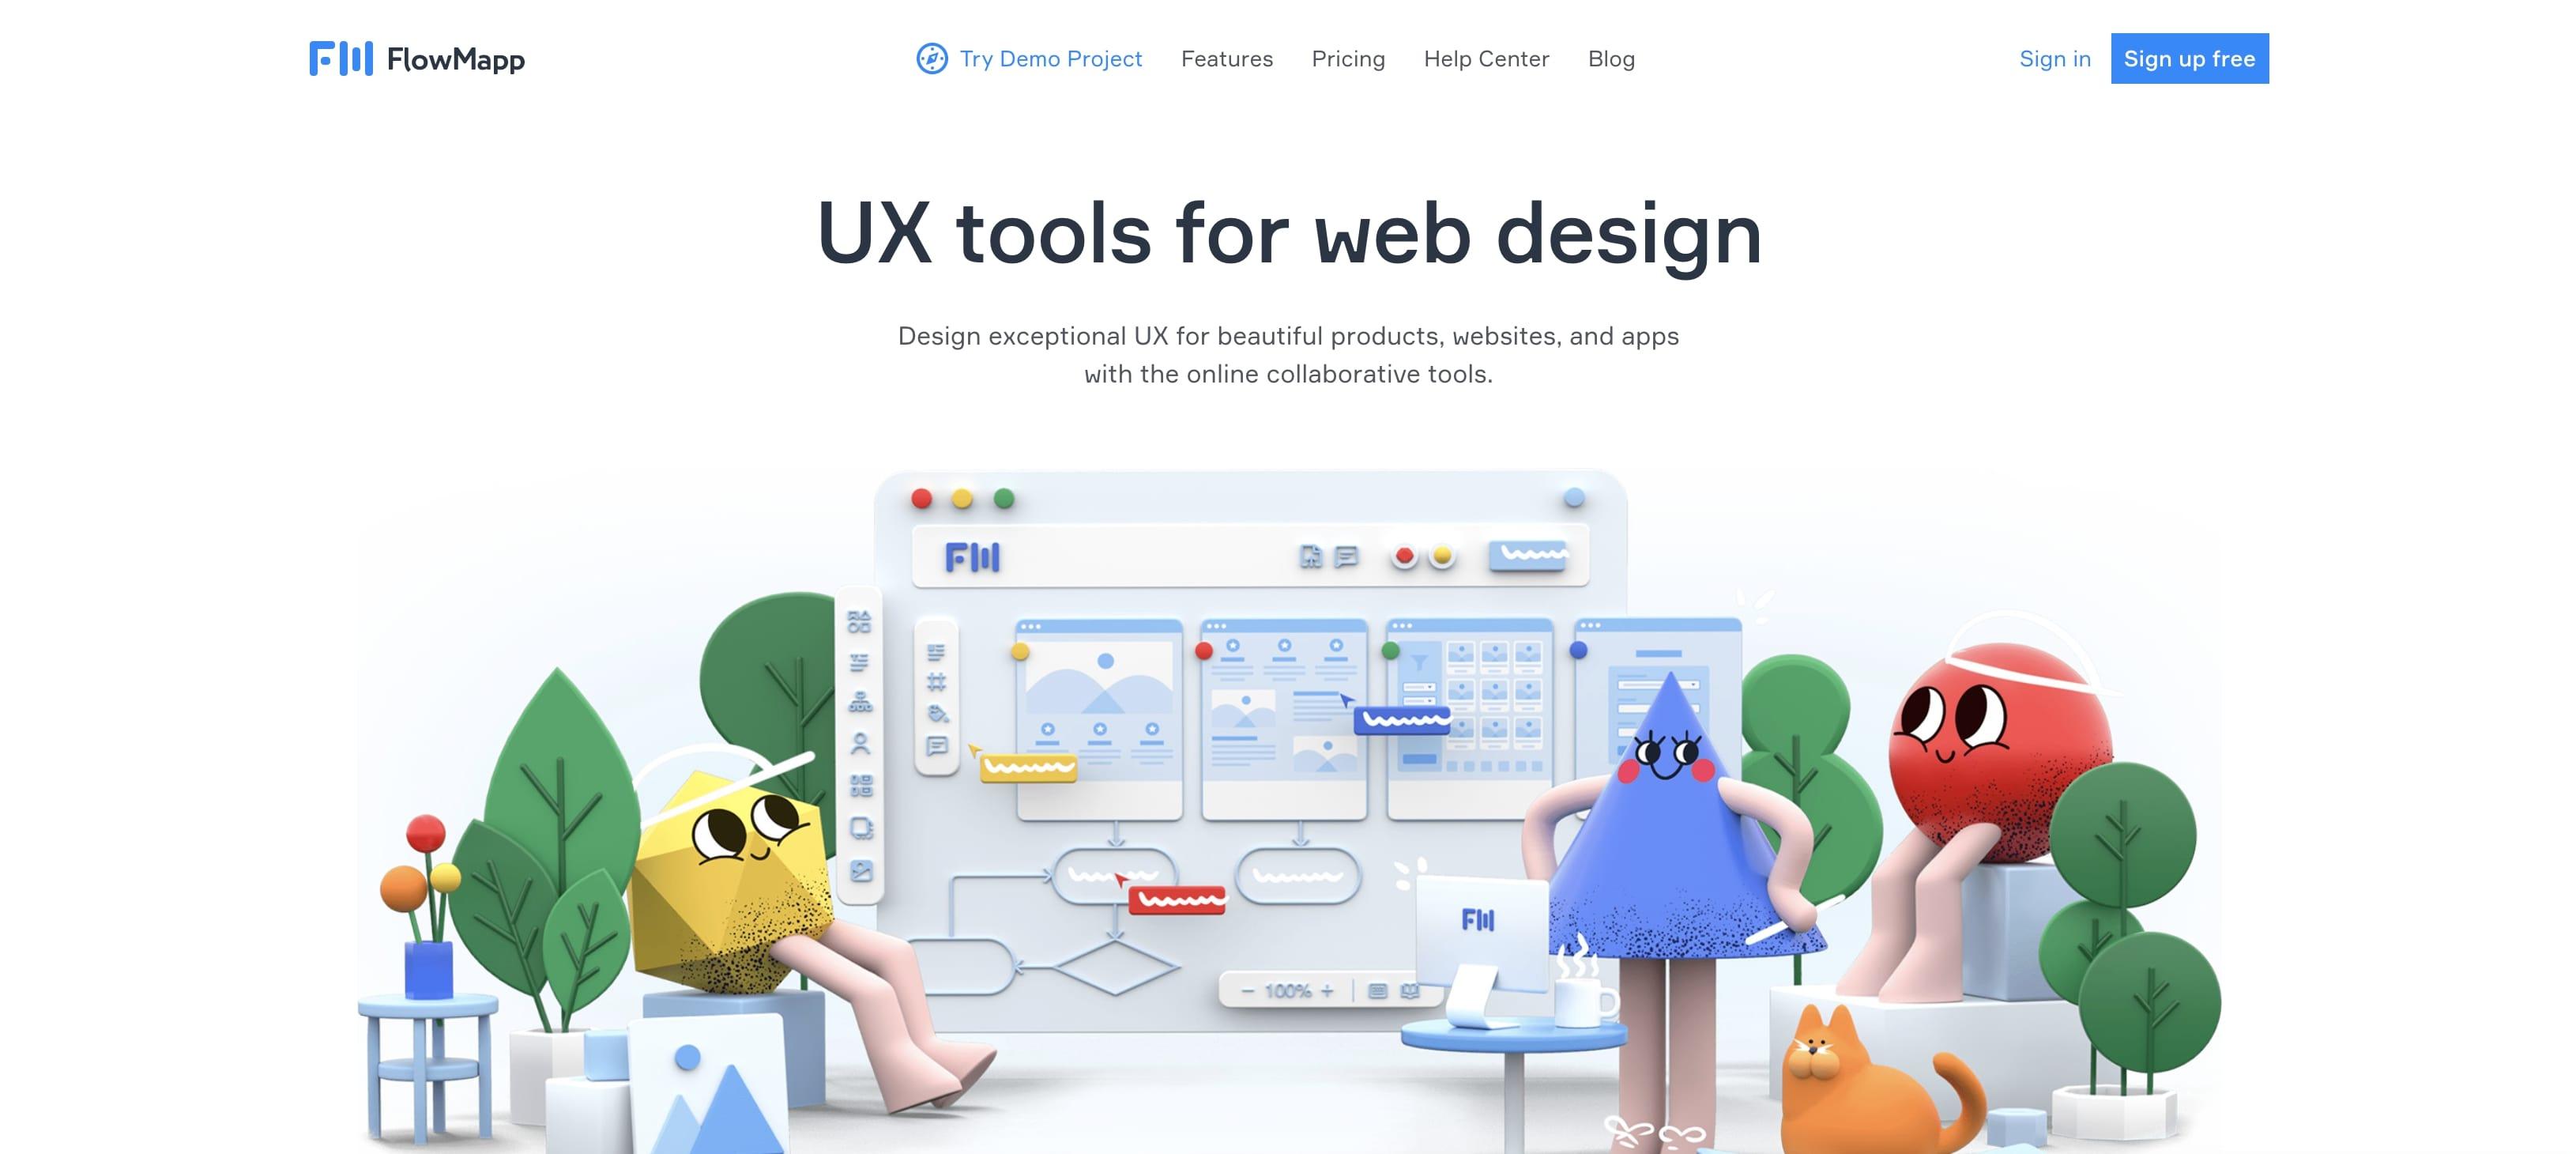 An image of the FlowMapp website.